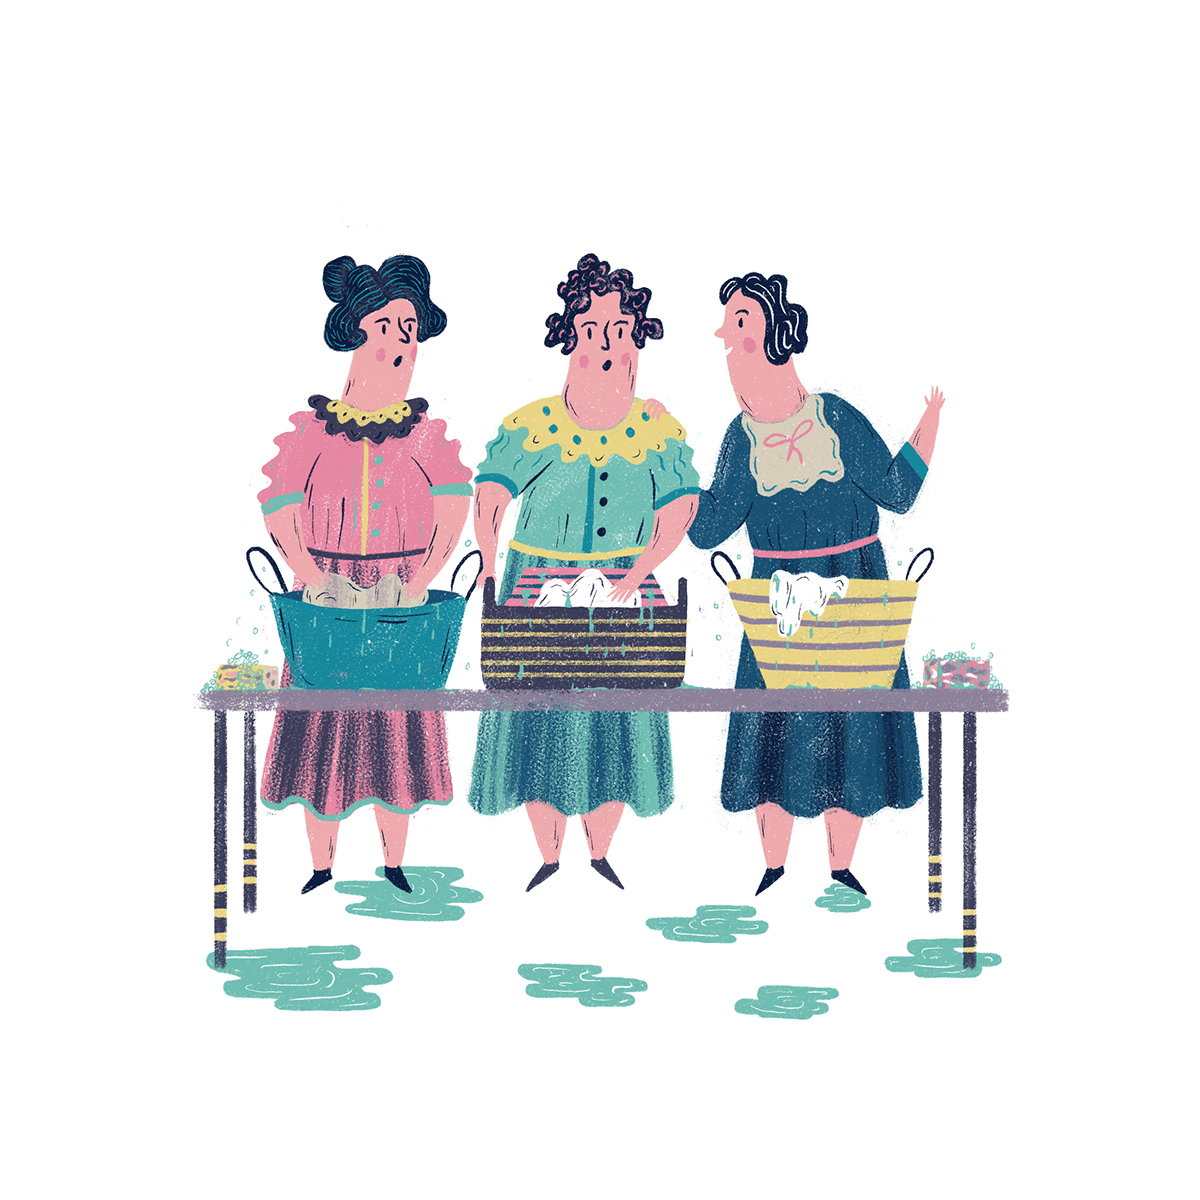 sisterMAG gossip yellowpress cybergossip